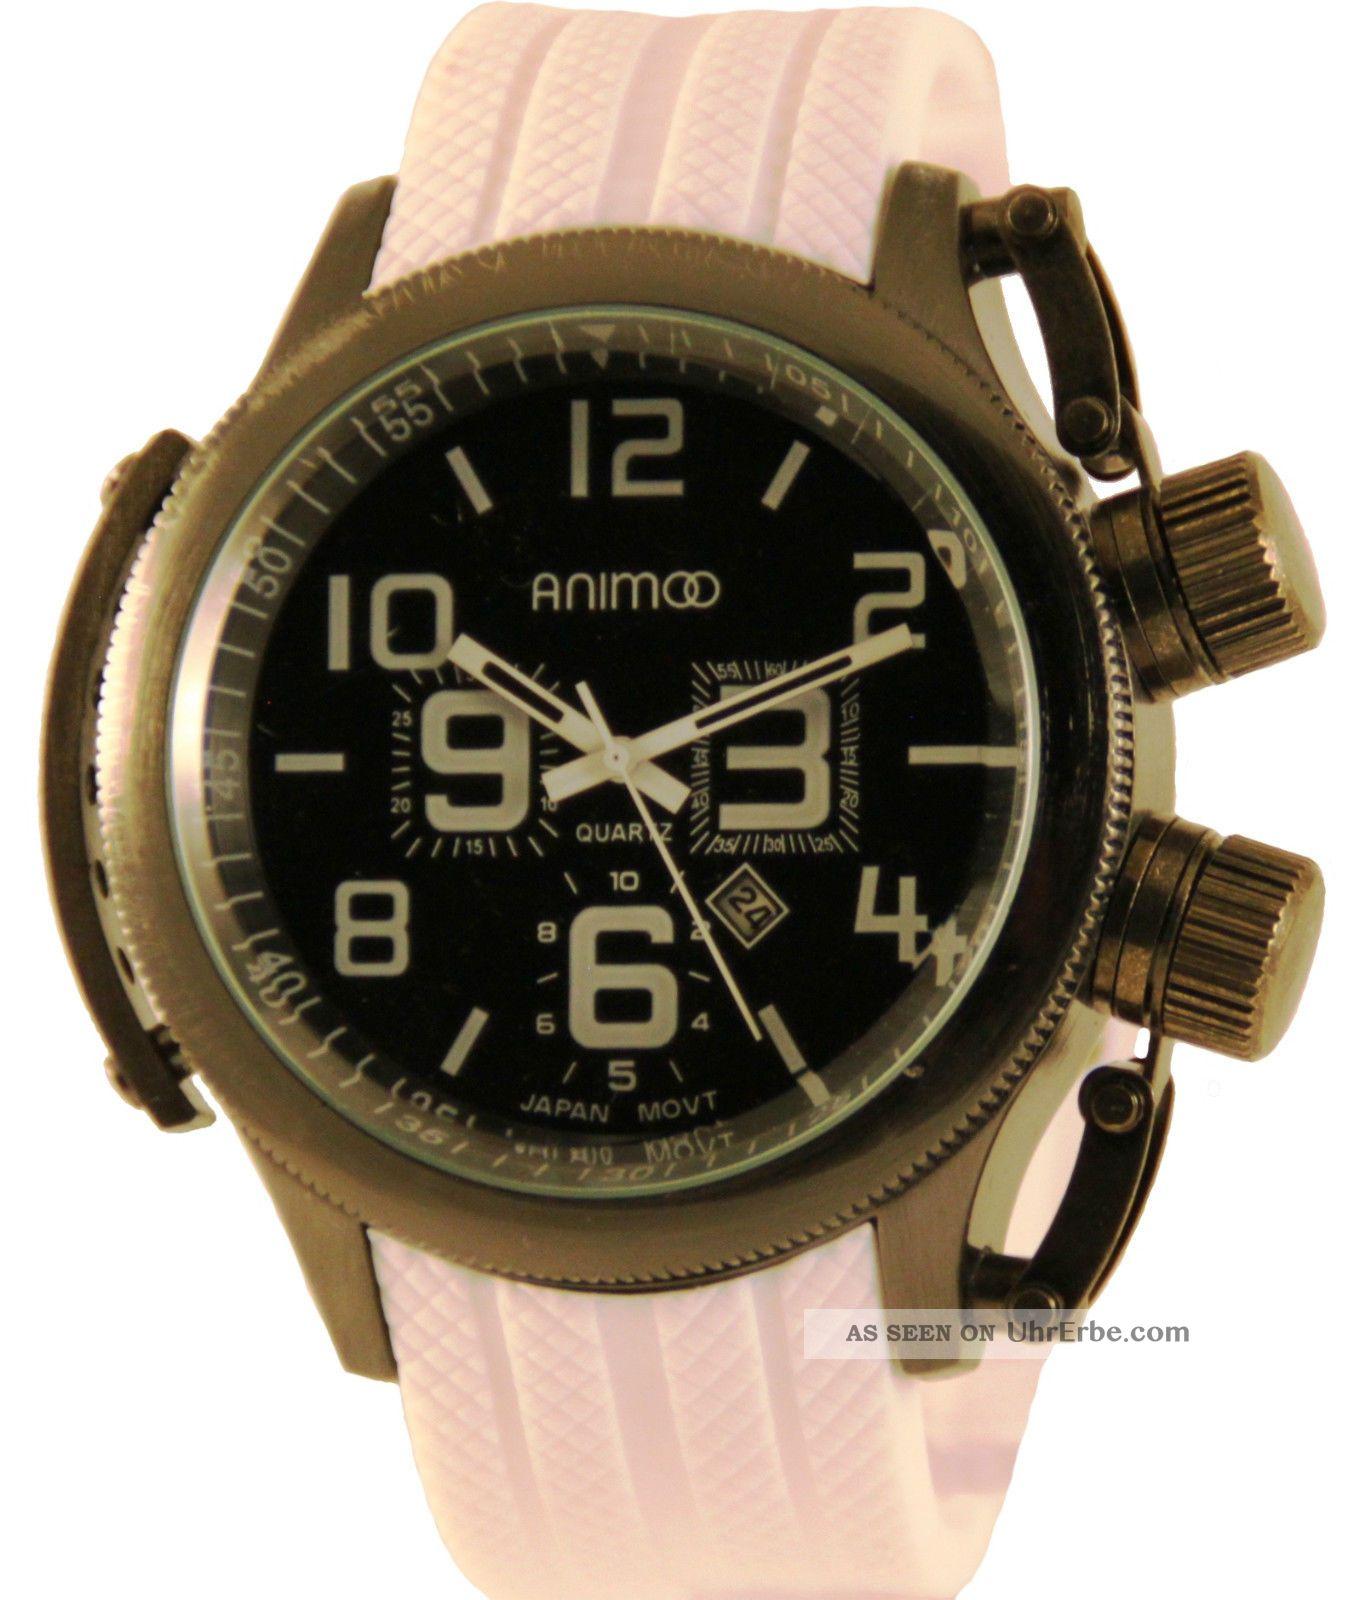 Schwere Animoo U - Boot Uhr Kautschuk Herrenuhr Analog Xxxl Armbanduhren Bild